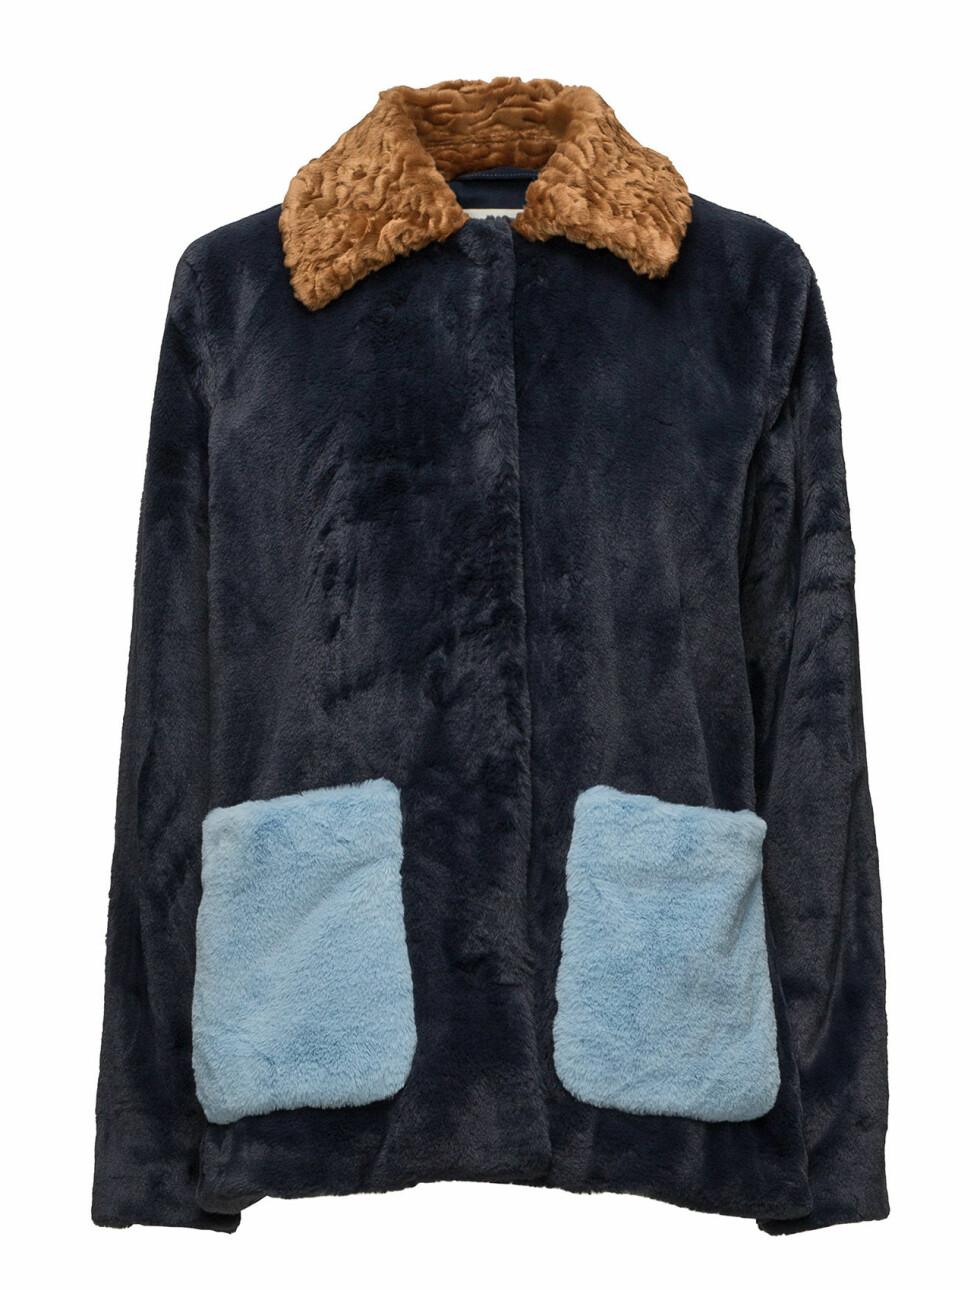 Fuskepels fra Modström |1999,-| https://www.boozt.com/no/no/modstrom/hannibal-jacket-multi_18646510/18646522?navId=69600&group=listing&position=1000000